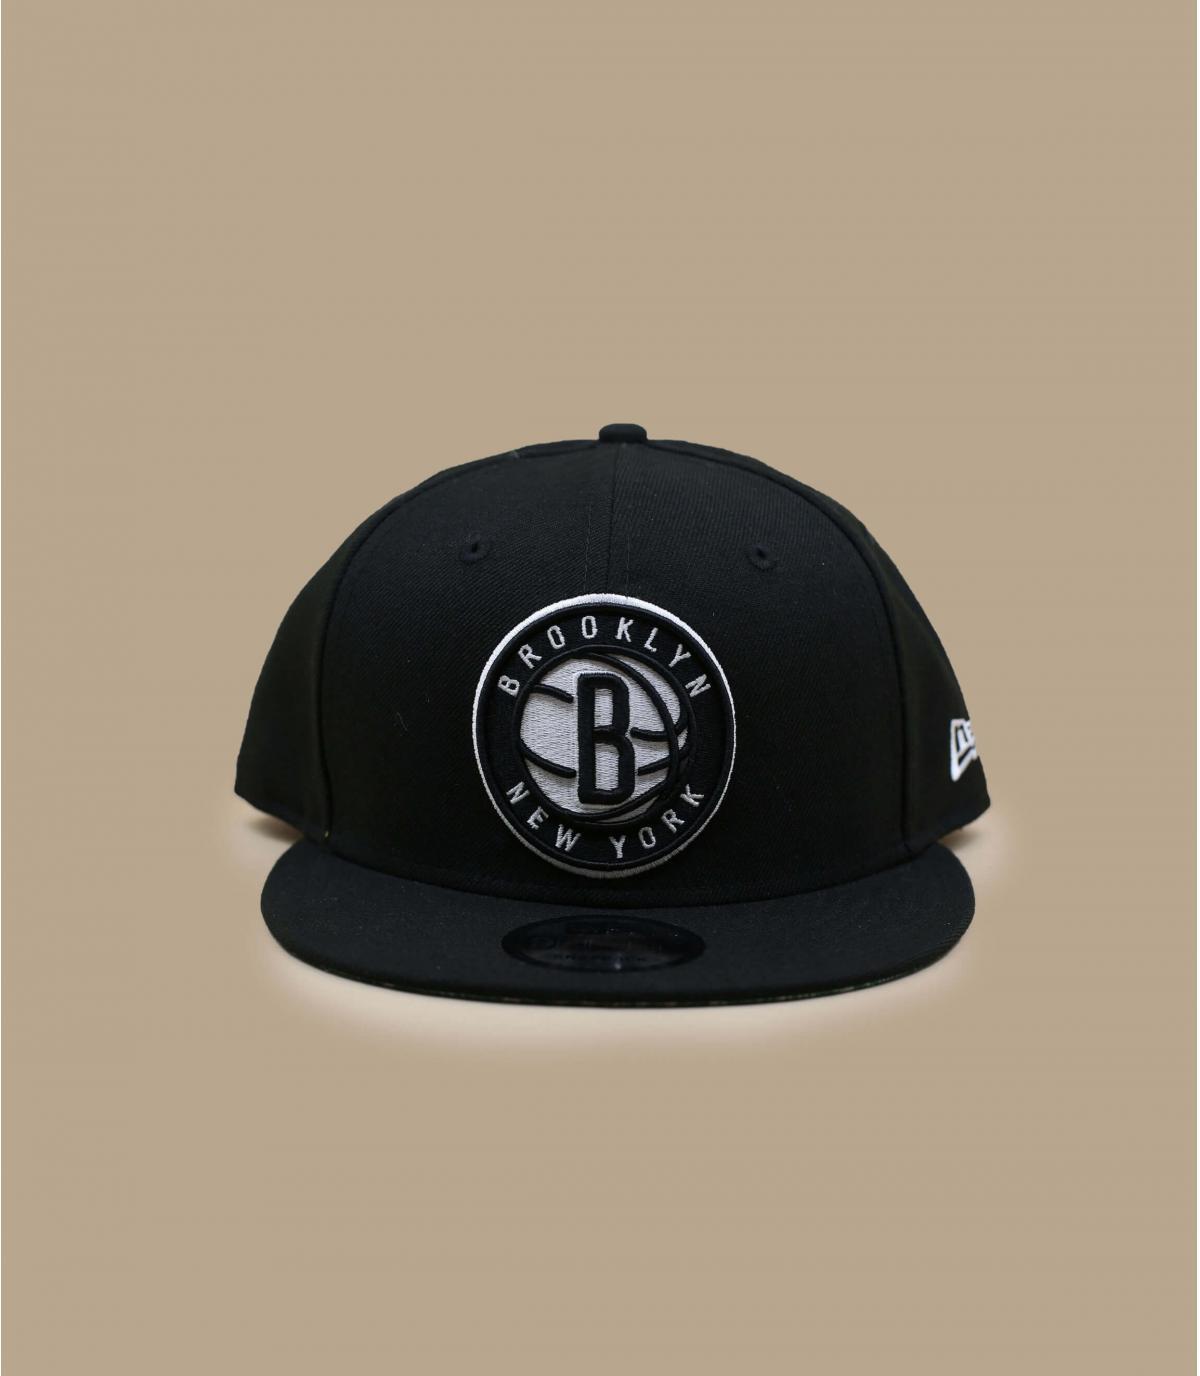 Détails Quickturn Paisley Brooklyn Nets 950 - image 2